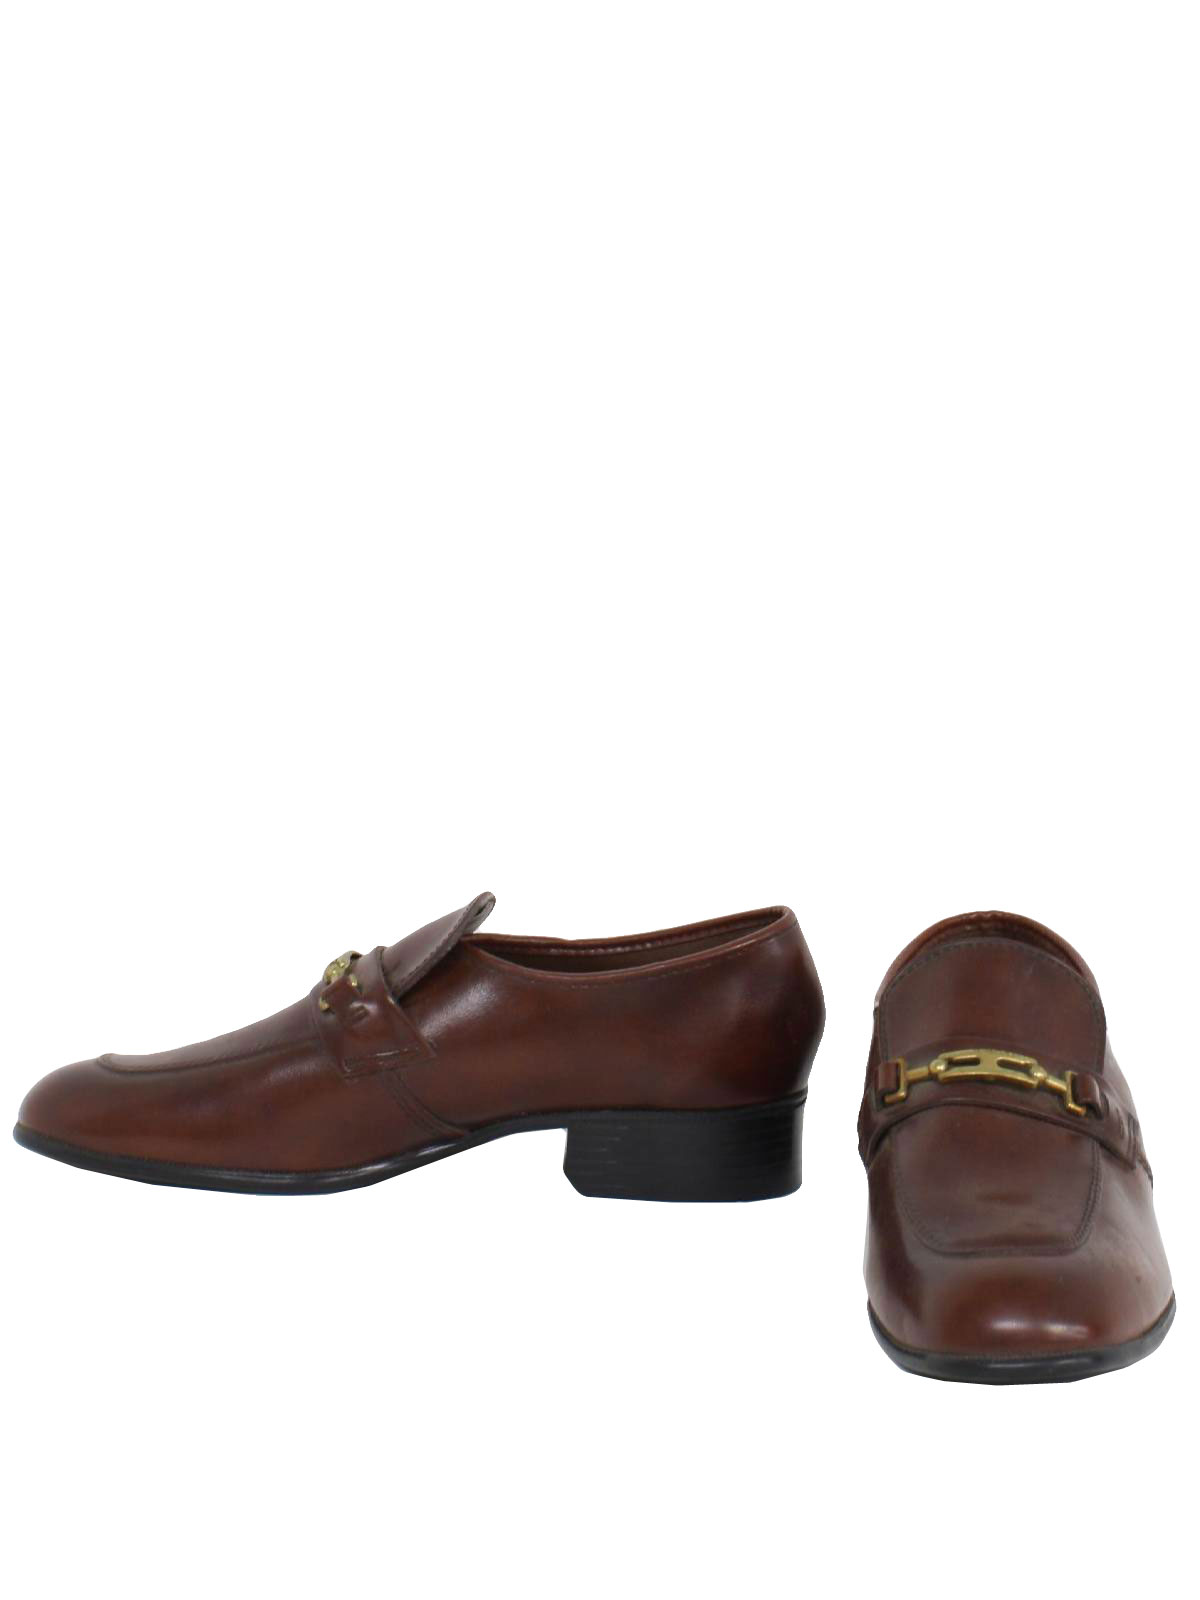 1970 S Vintage Montgomery Ward Shoes 70s Montgomery Ward